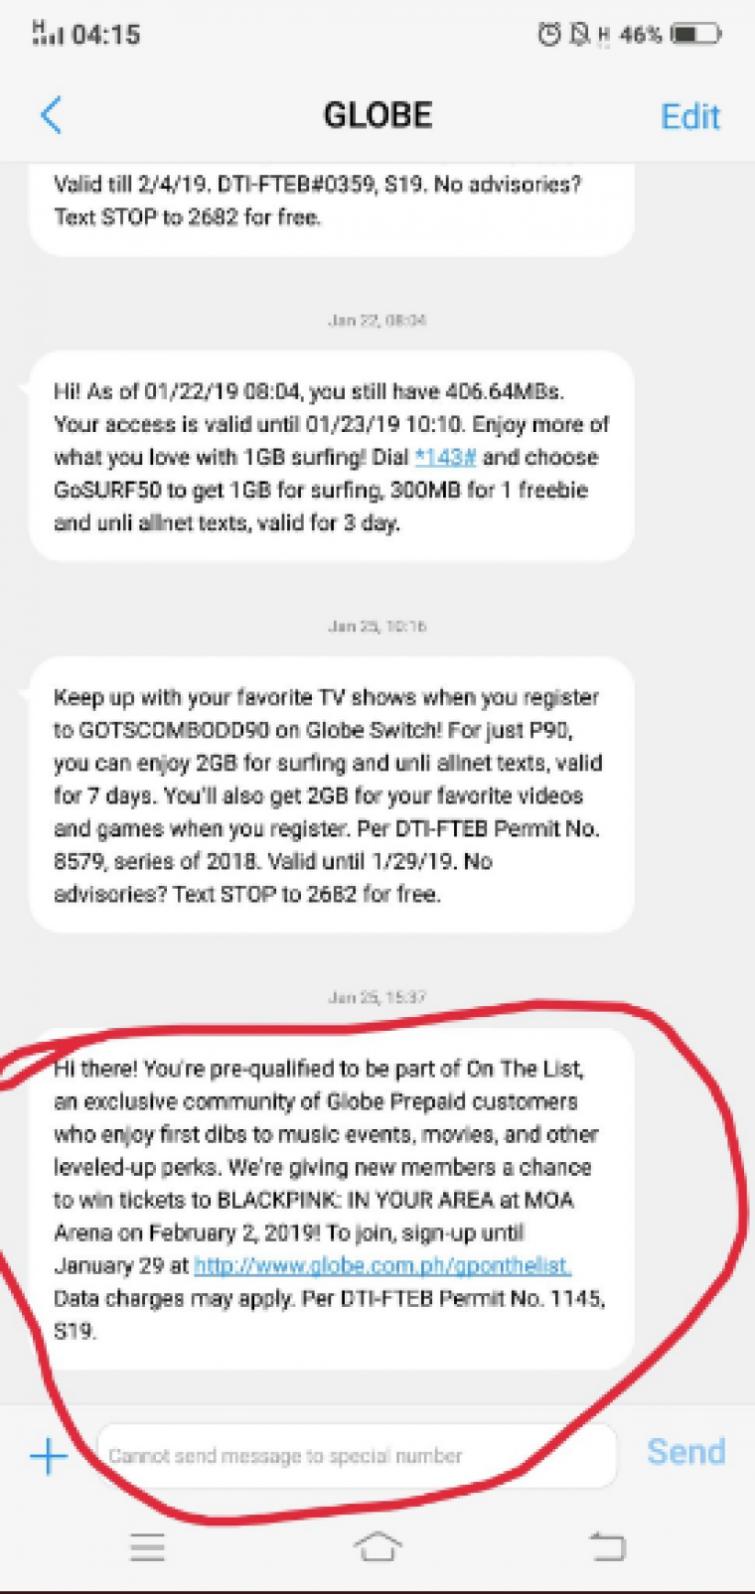 Screenshot of Globe communication